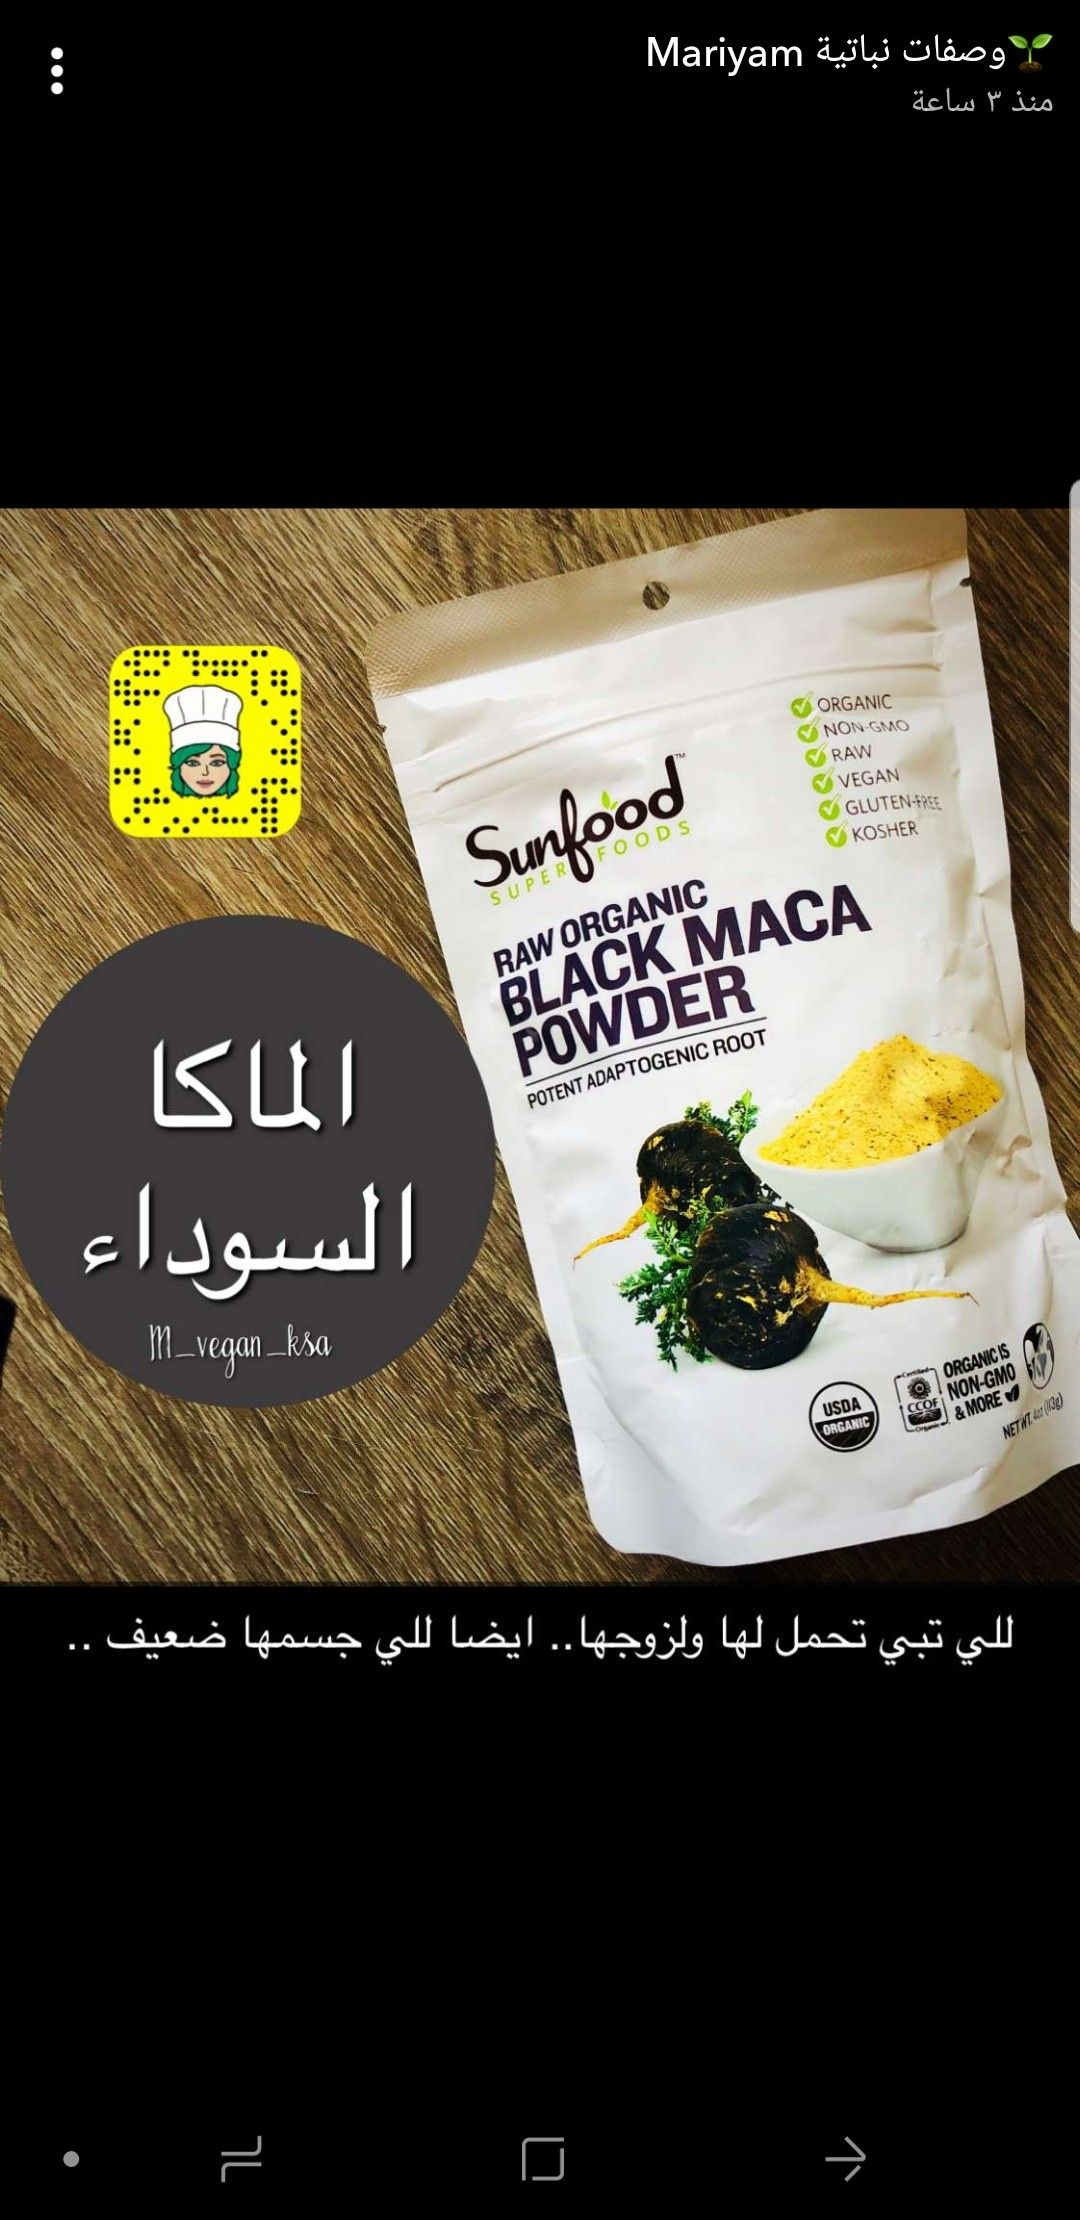 Pin By Mariam Aldhaheri On تغذية علاجية المعدة بيت الداء و الدواء توعية Food Bread Matzo